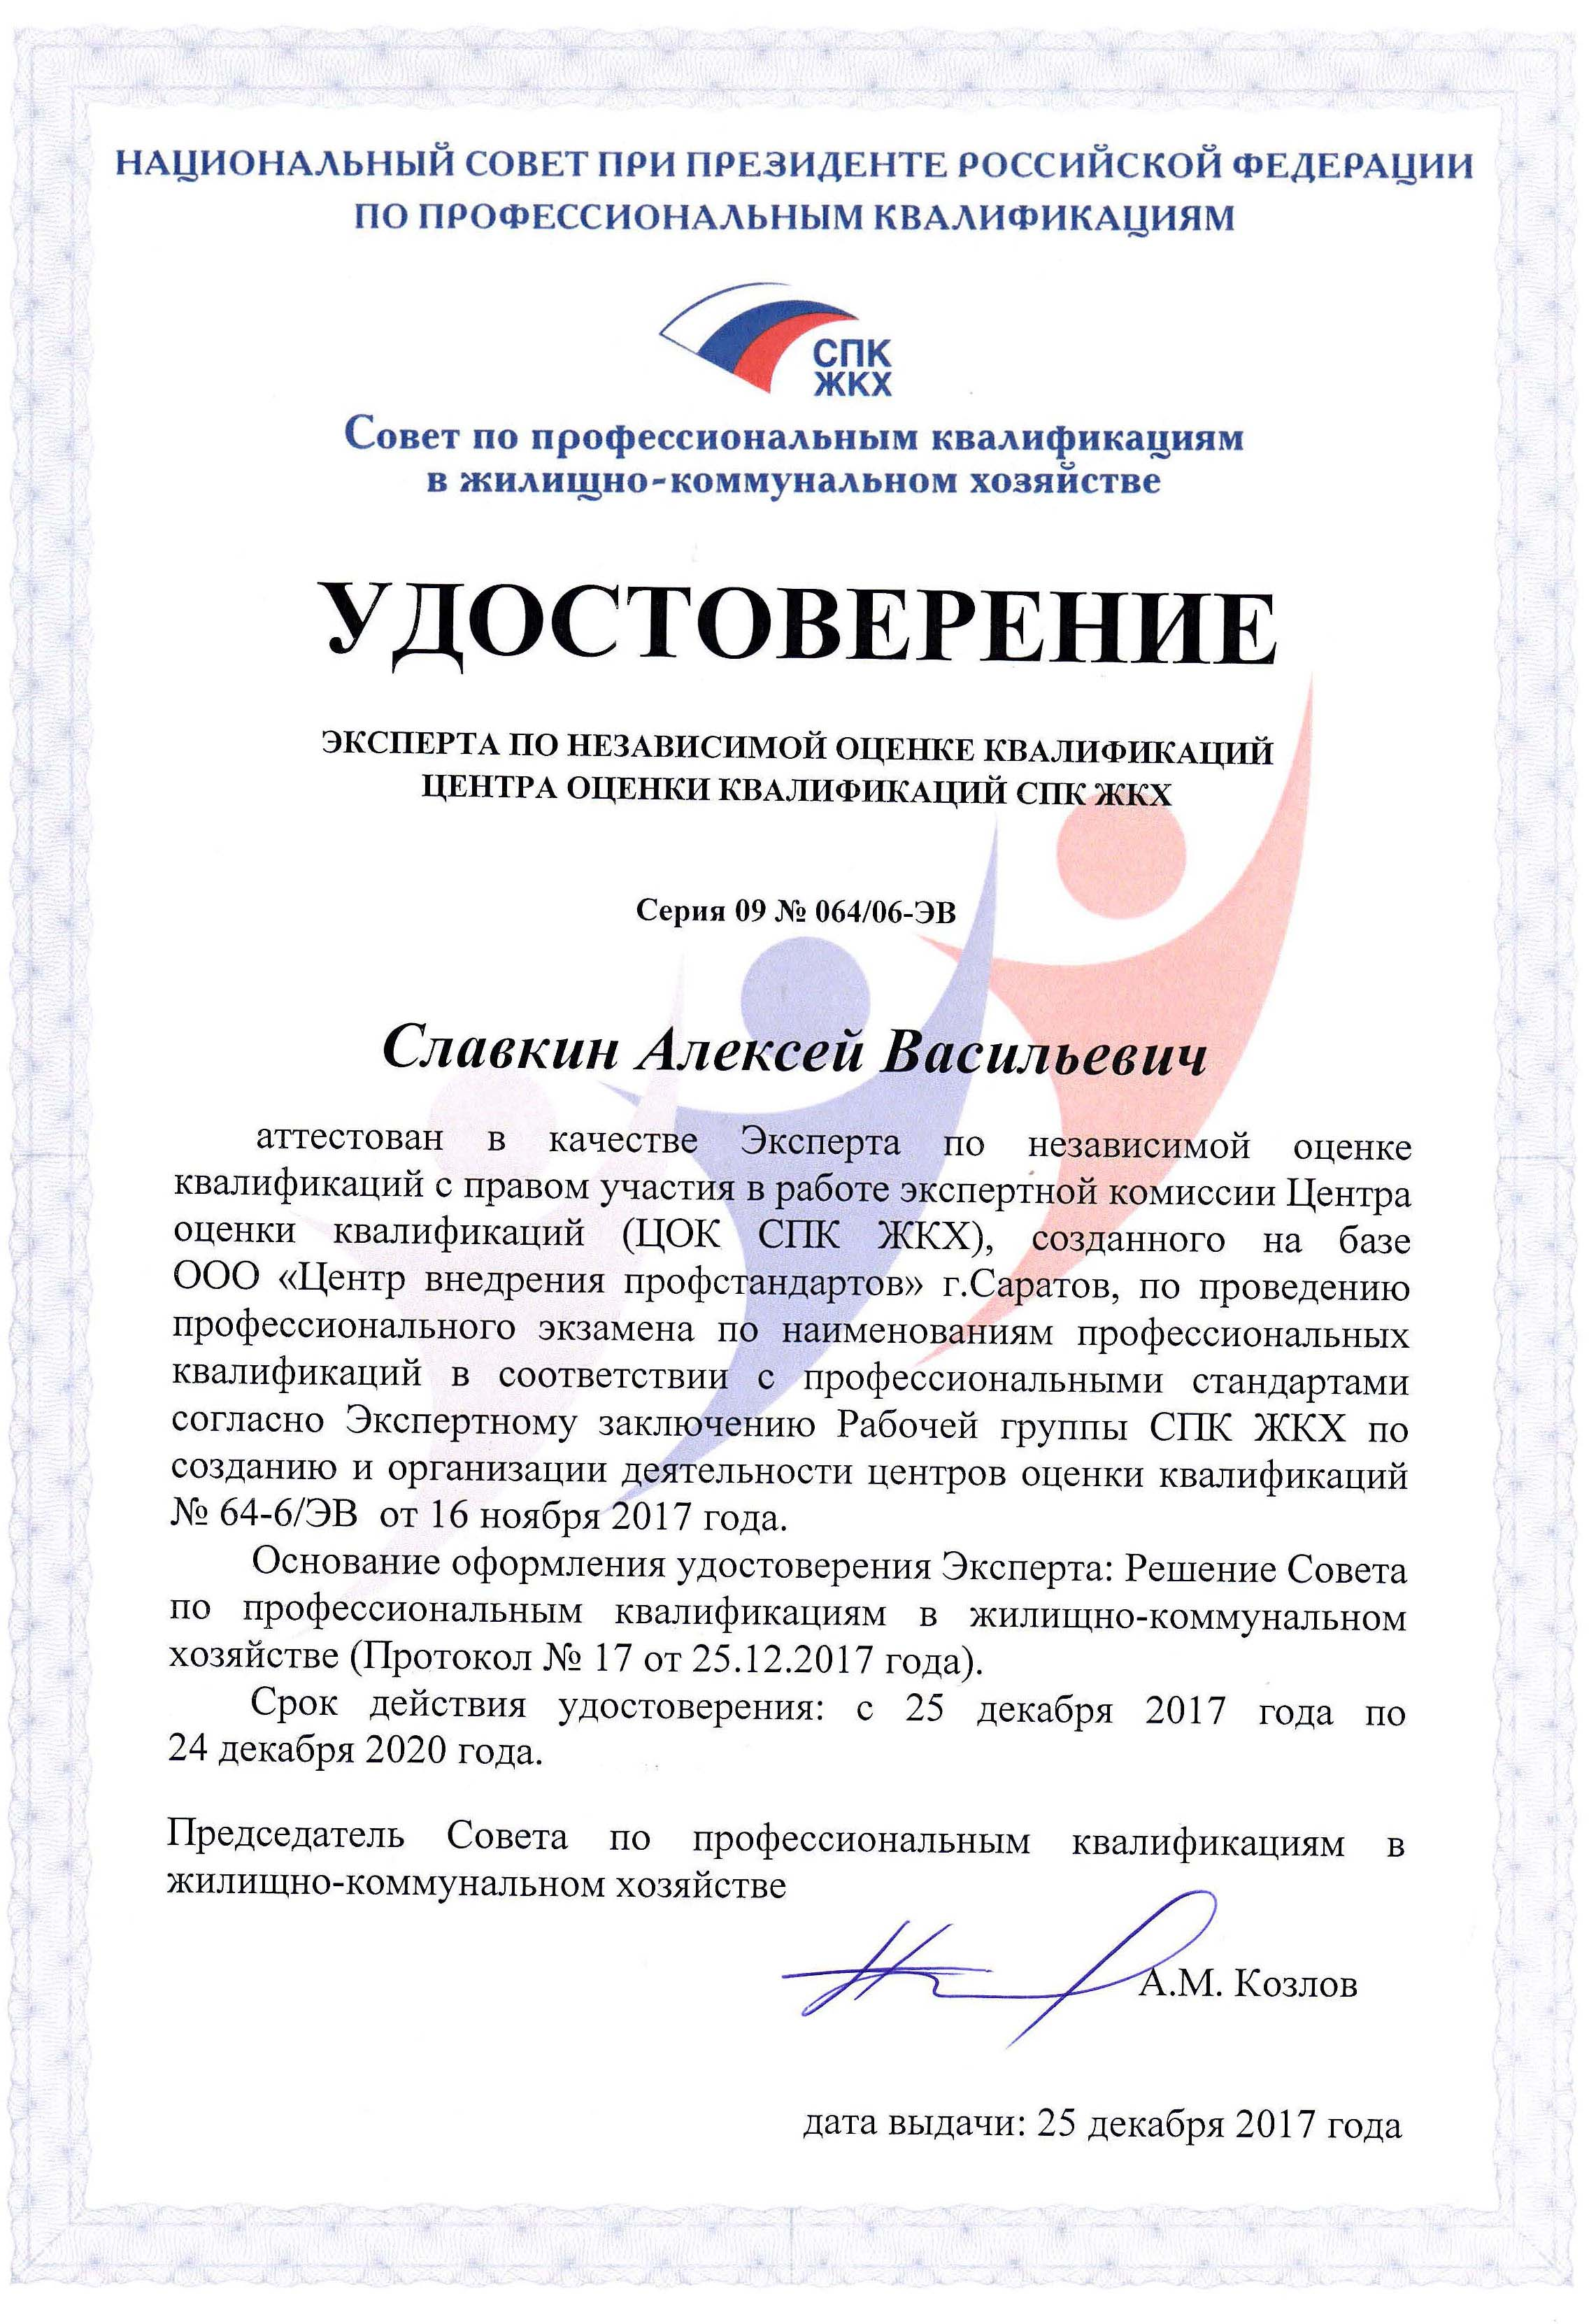 Славкин